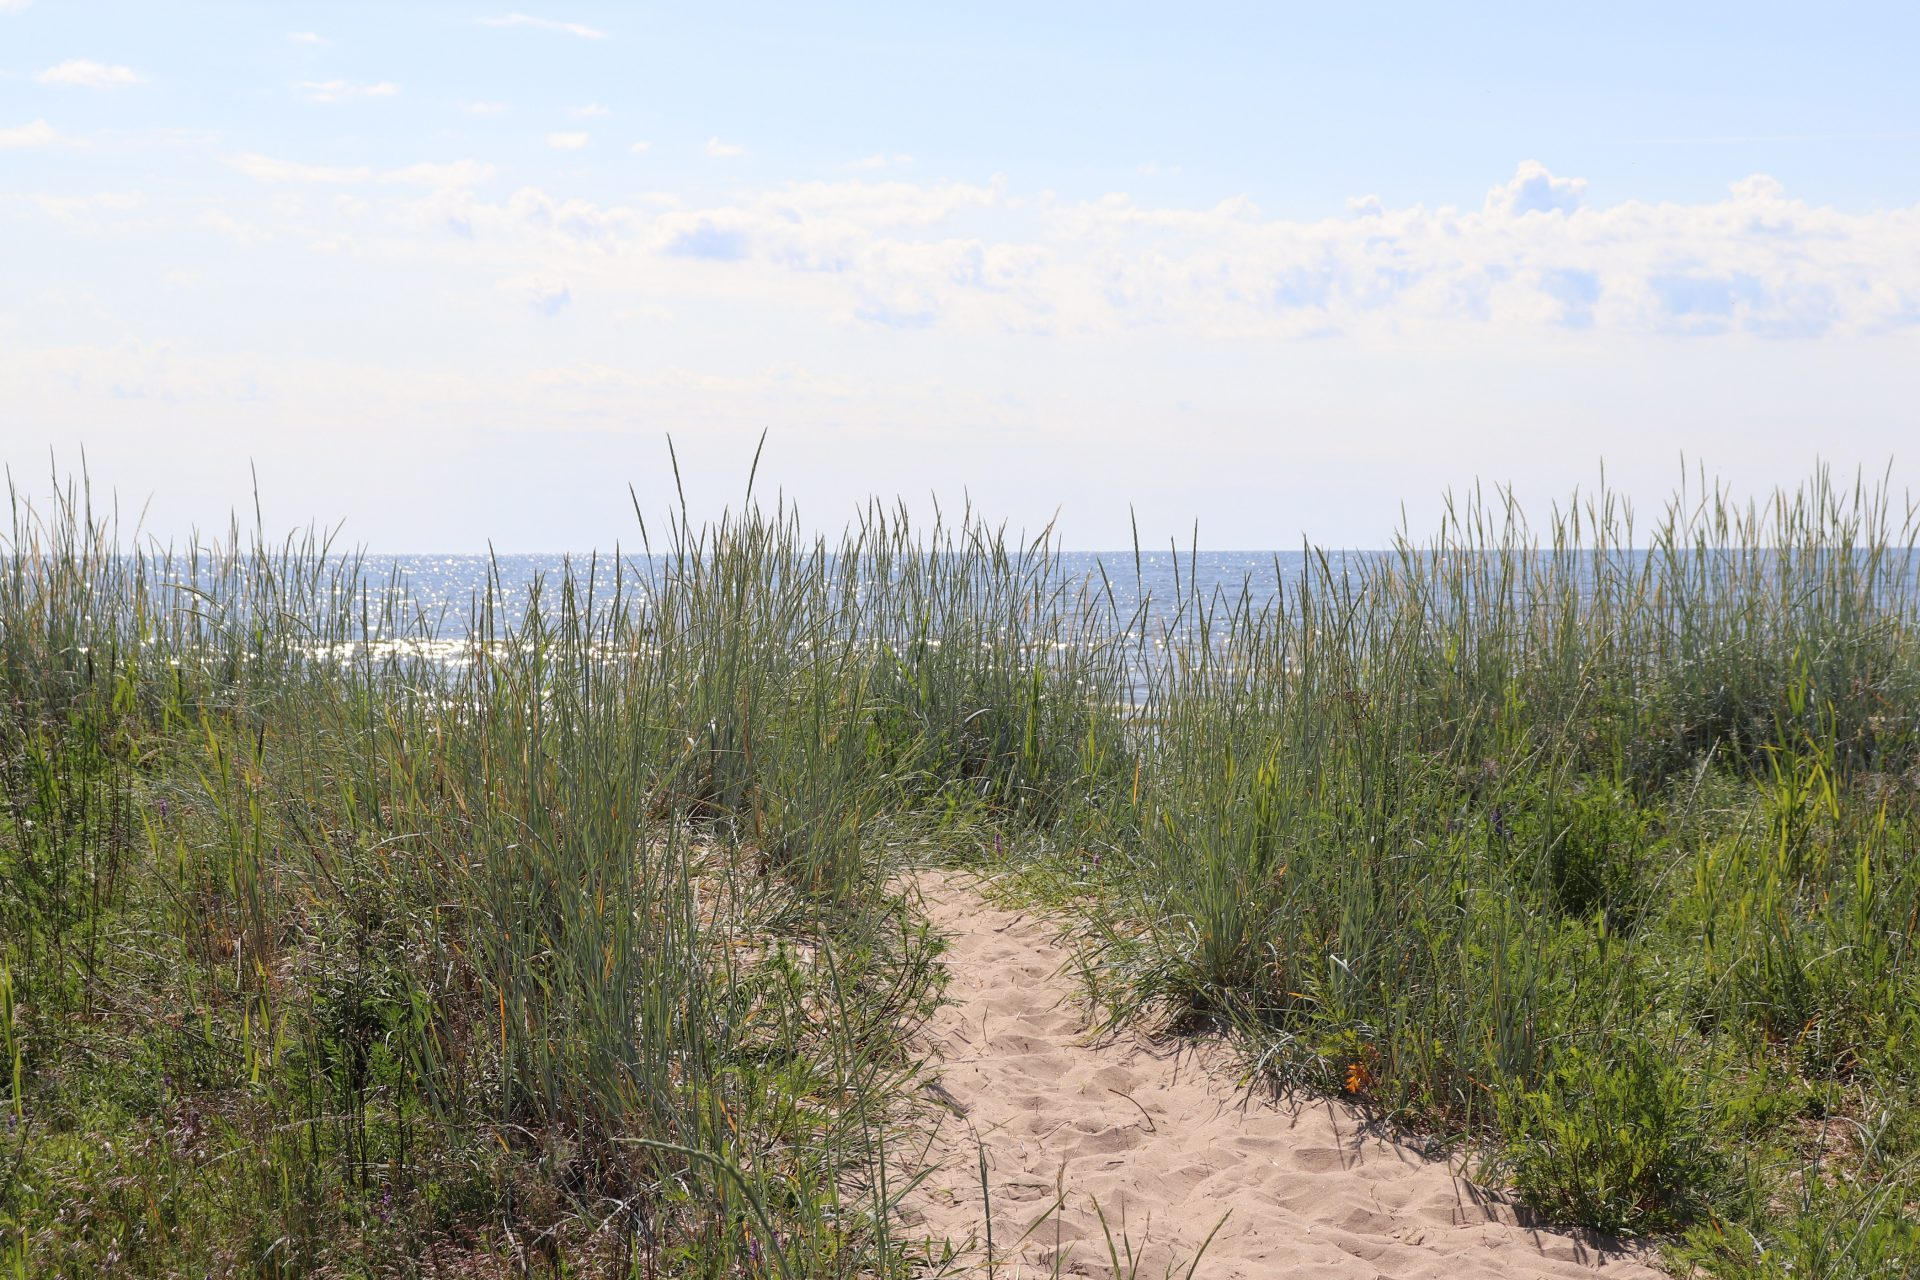 Hailuoto meri hiekkaranta ranta ruoho meri